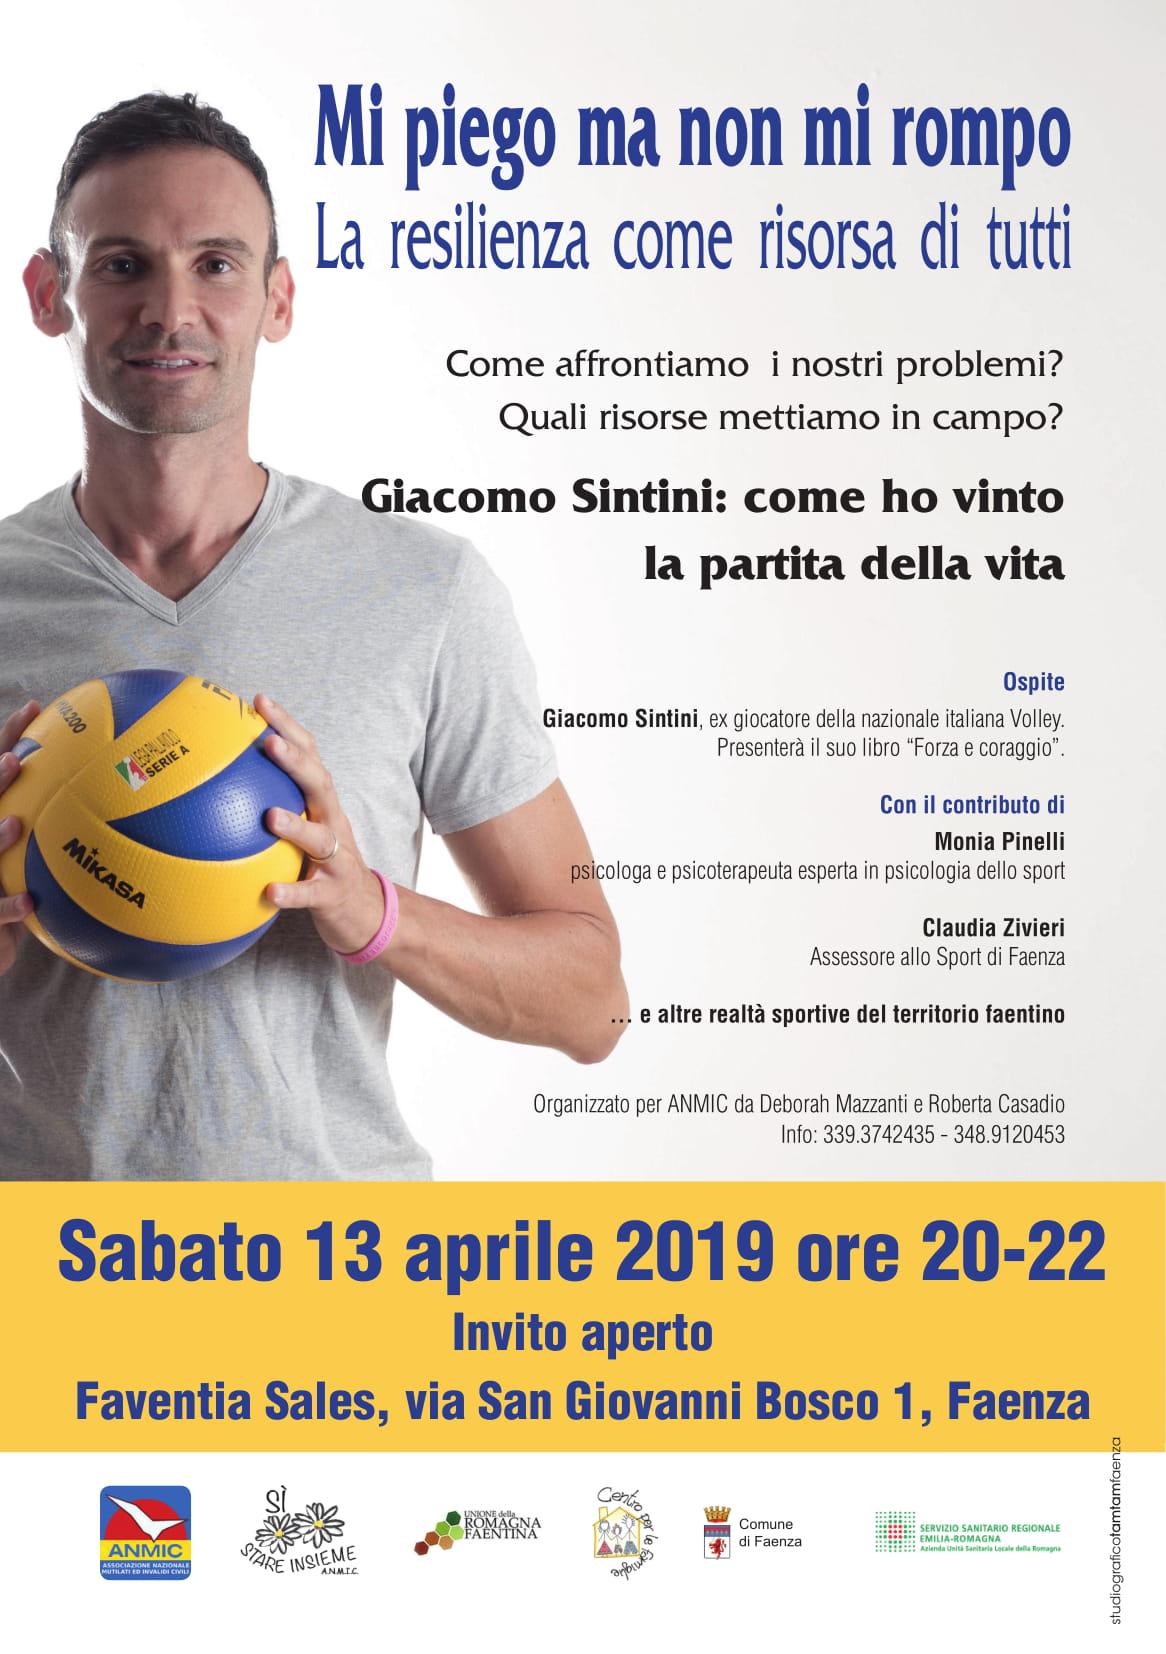 13.4.19 - Giacomo Sintini centro per le famiglie-1